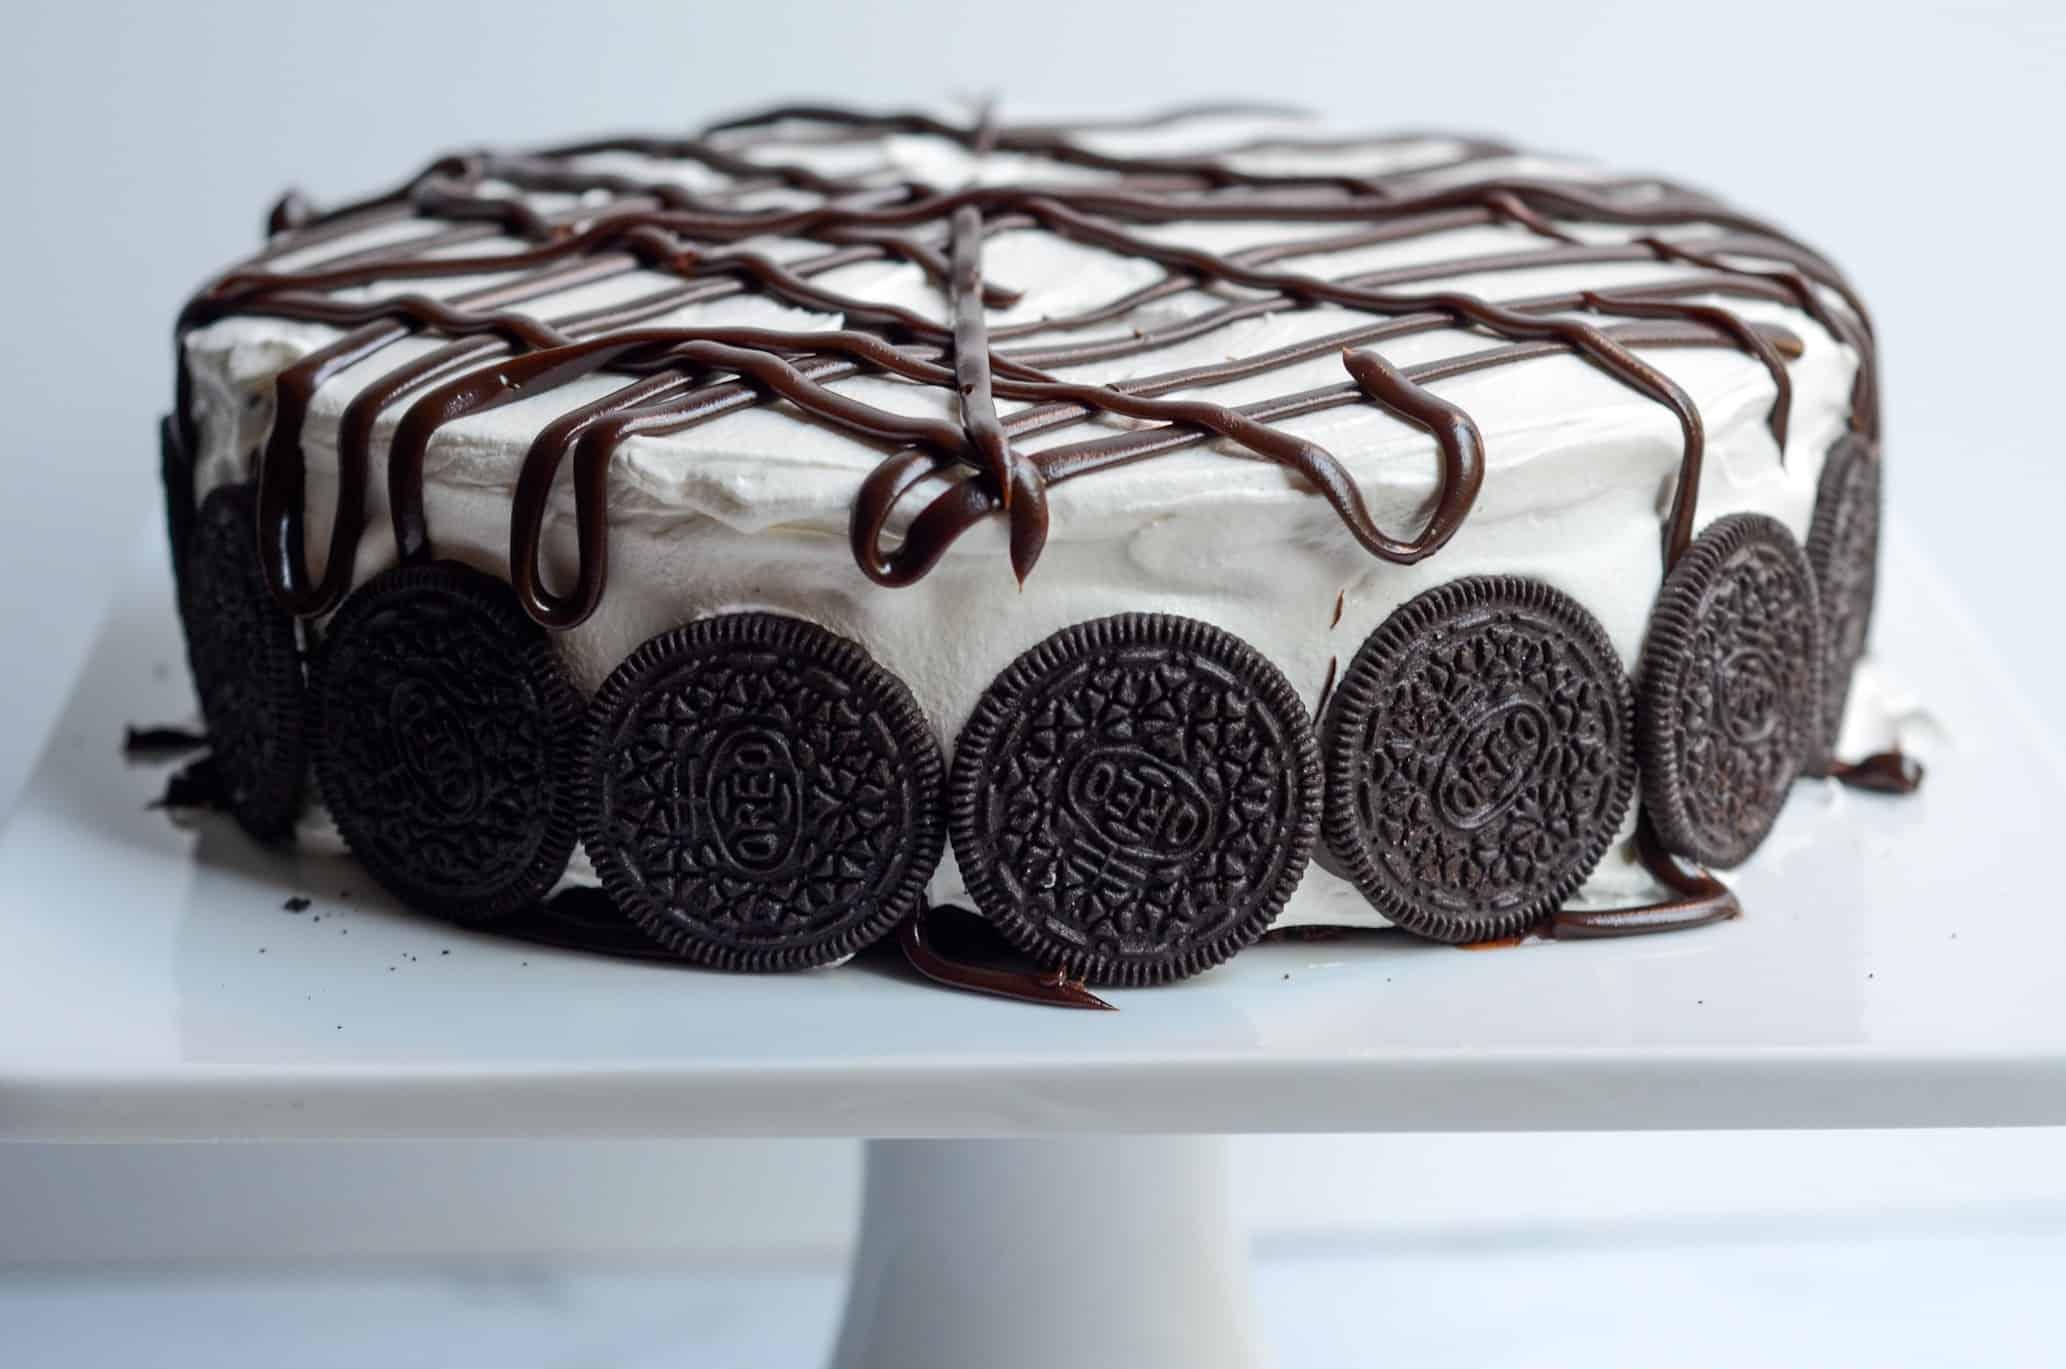 cookies and cream ice cream cake